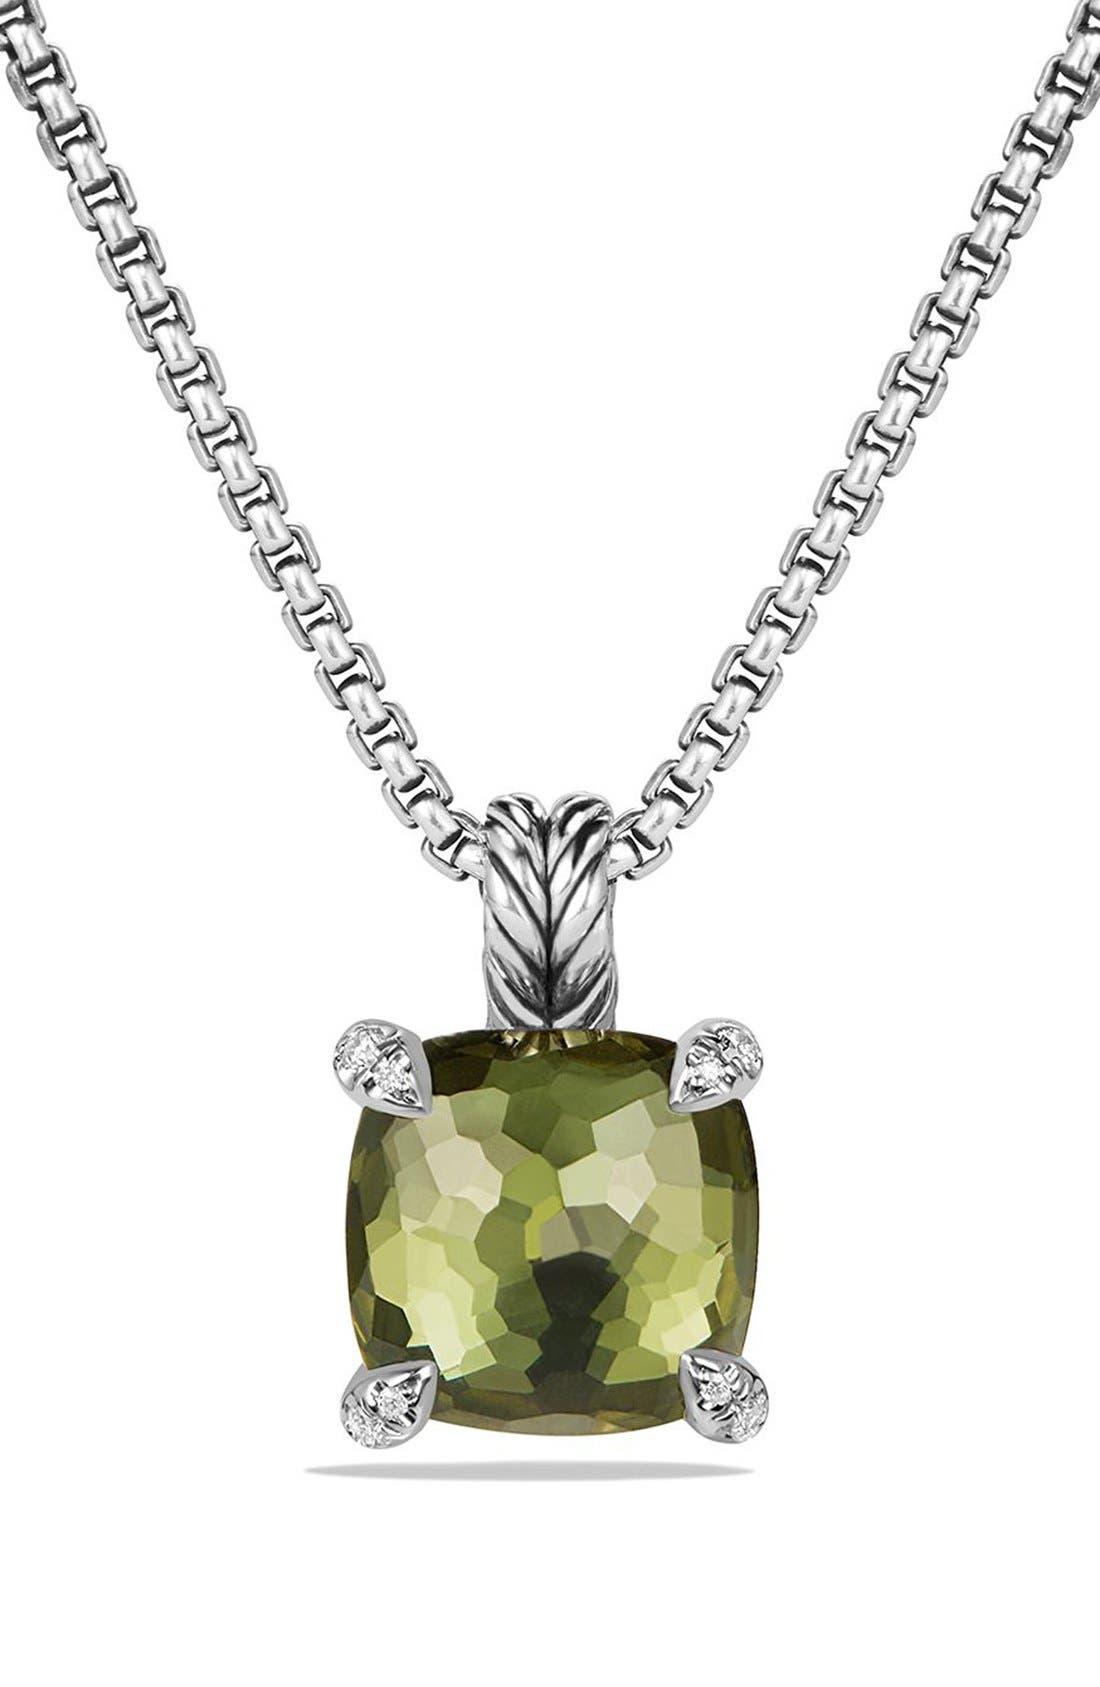 DAVID YURMAN 'Châtelaine' Pendant Necklace with Semiprecious Stone & Diamonds, Main, color, SILVER/ CITRINE/ HEMATINE